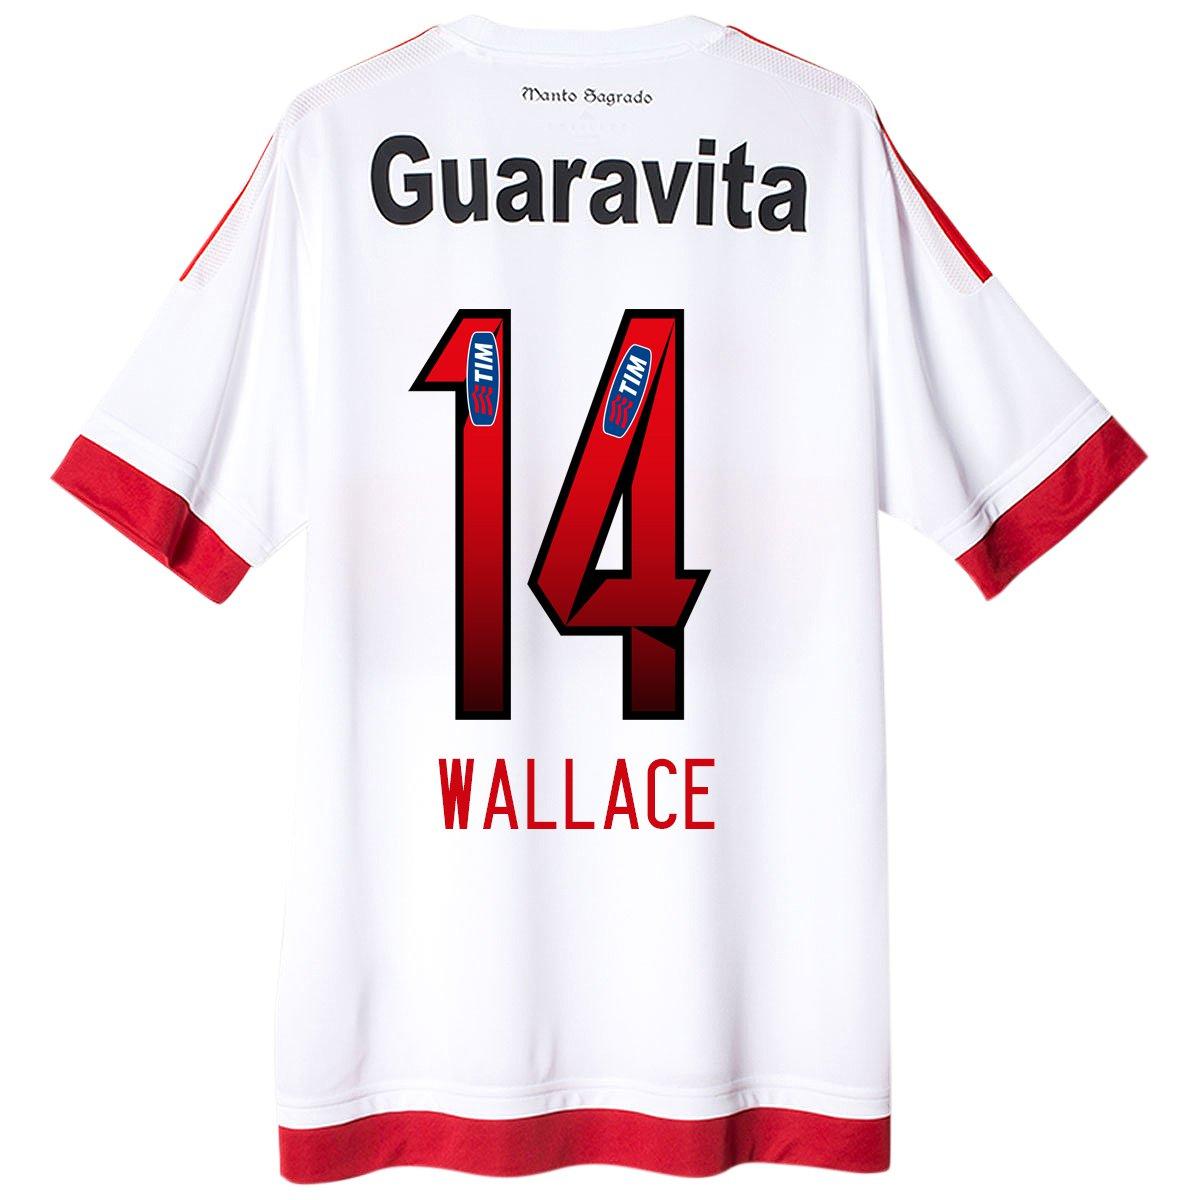 Camisa Adidas Flamengo II 15 16 nº 14 - Wallace - Compre Agora ... 703733c8b47